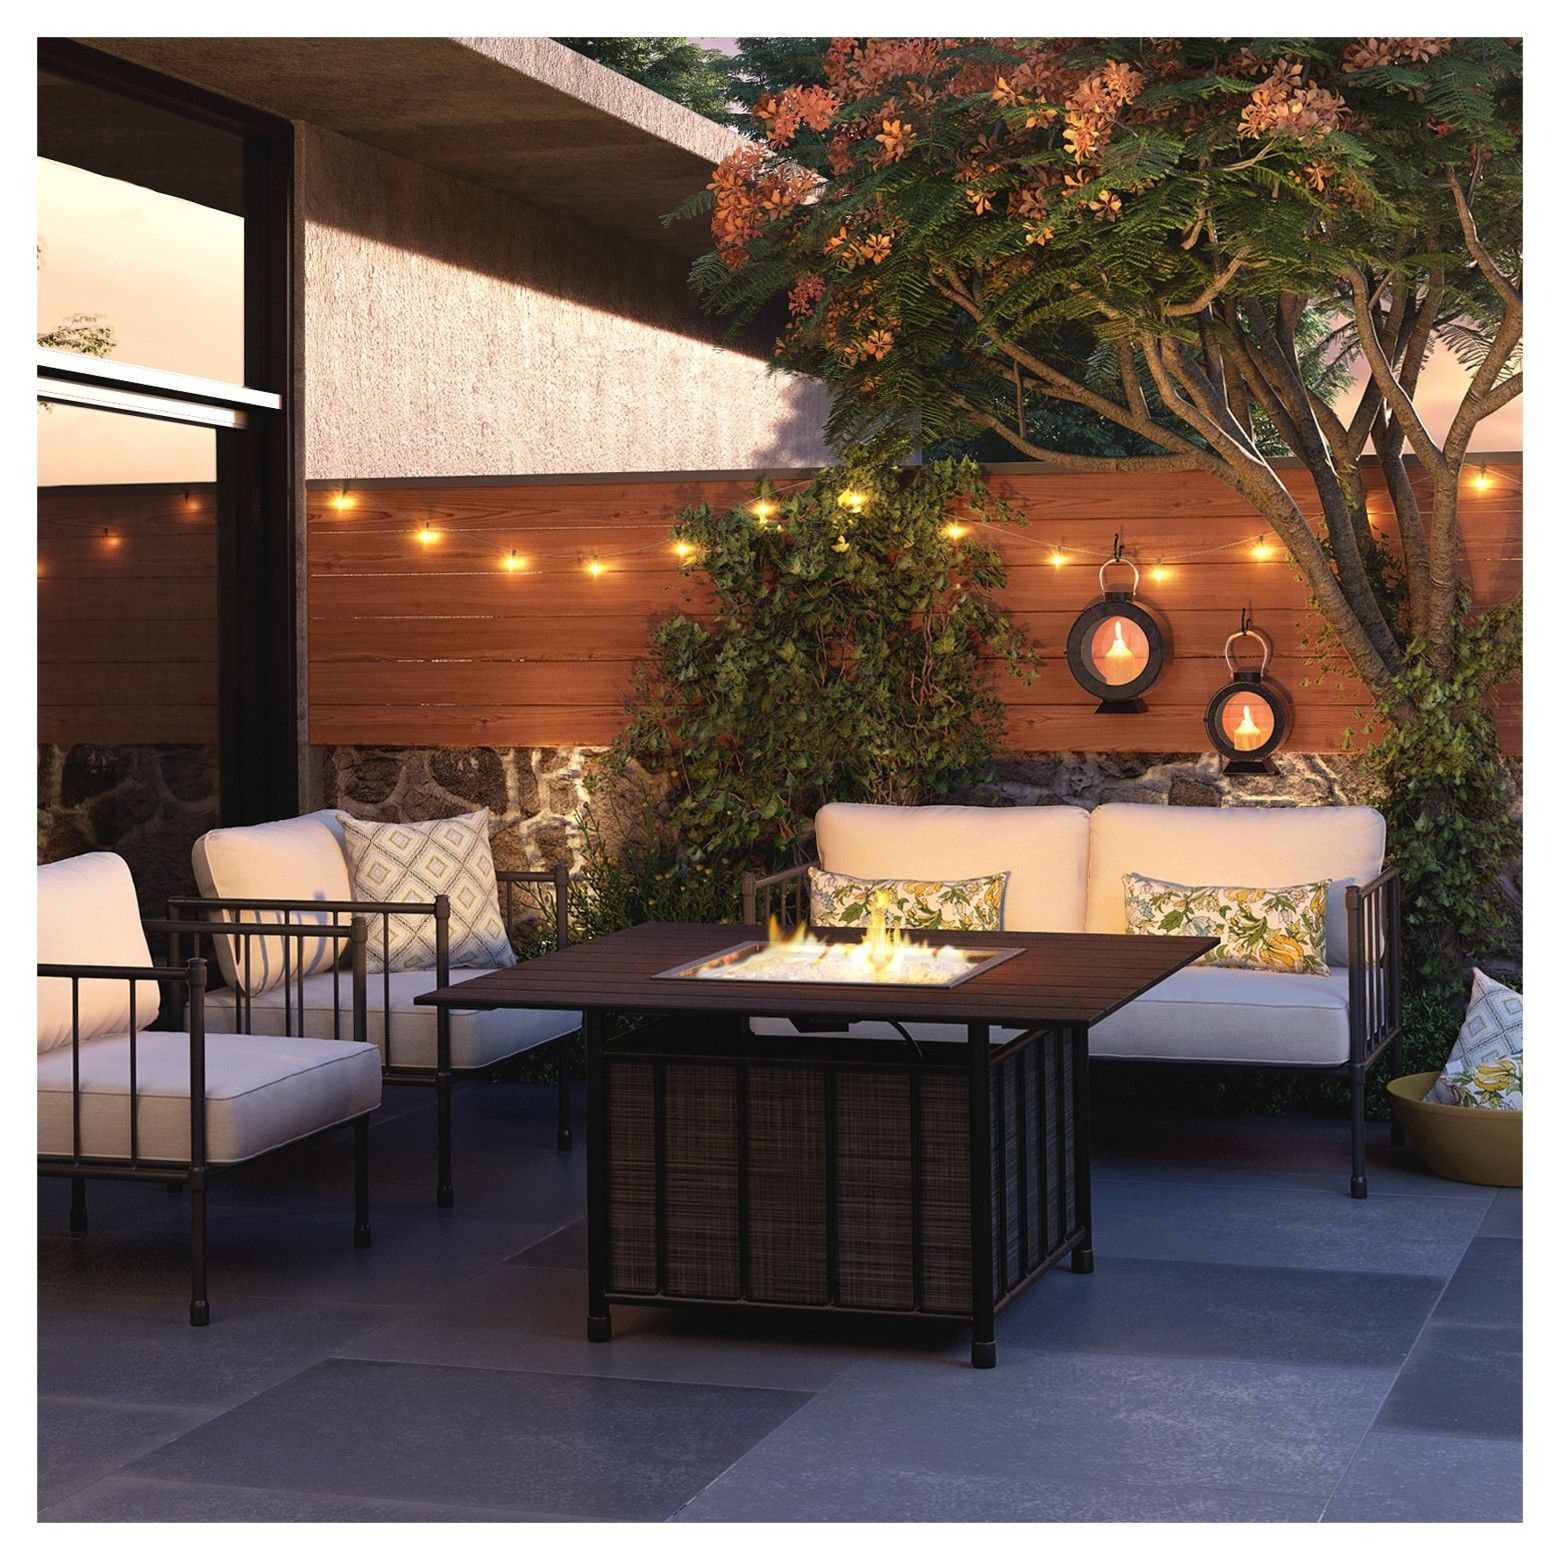 fernhill 4 pc metal patio fire chat set linen threshold